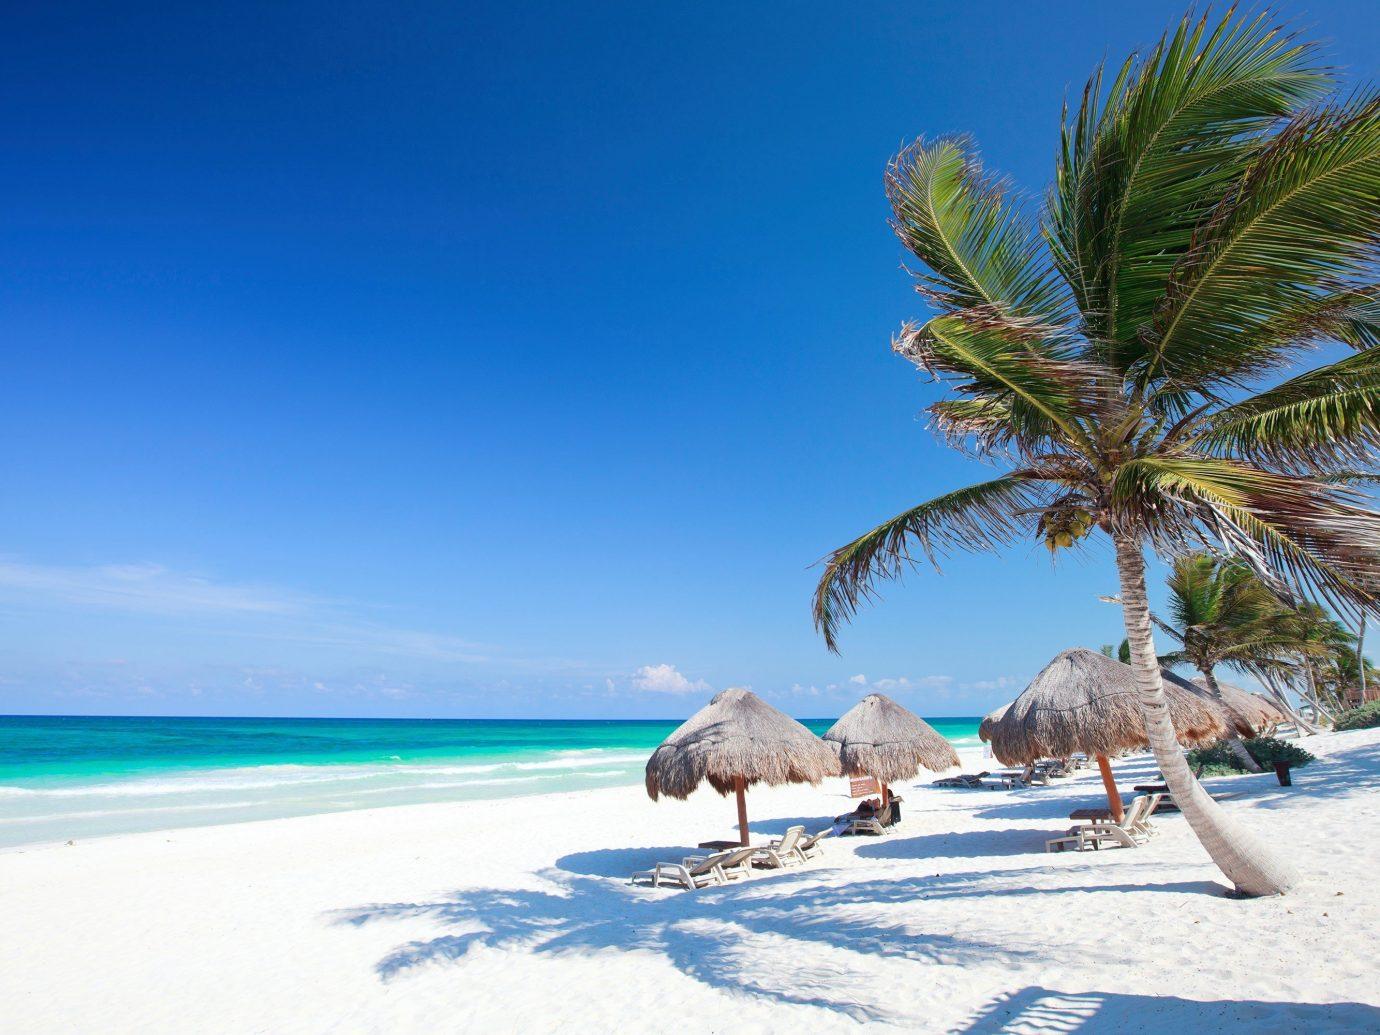 palm hut umbrellas on a sandy beach in Tulum